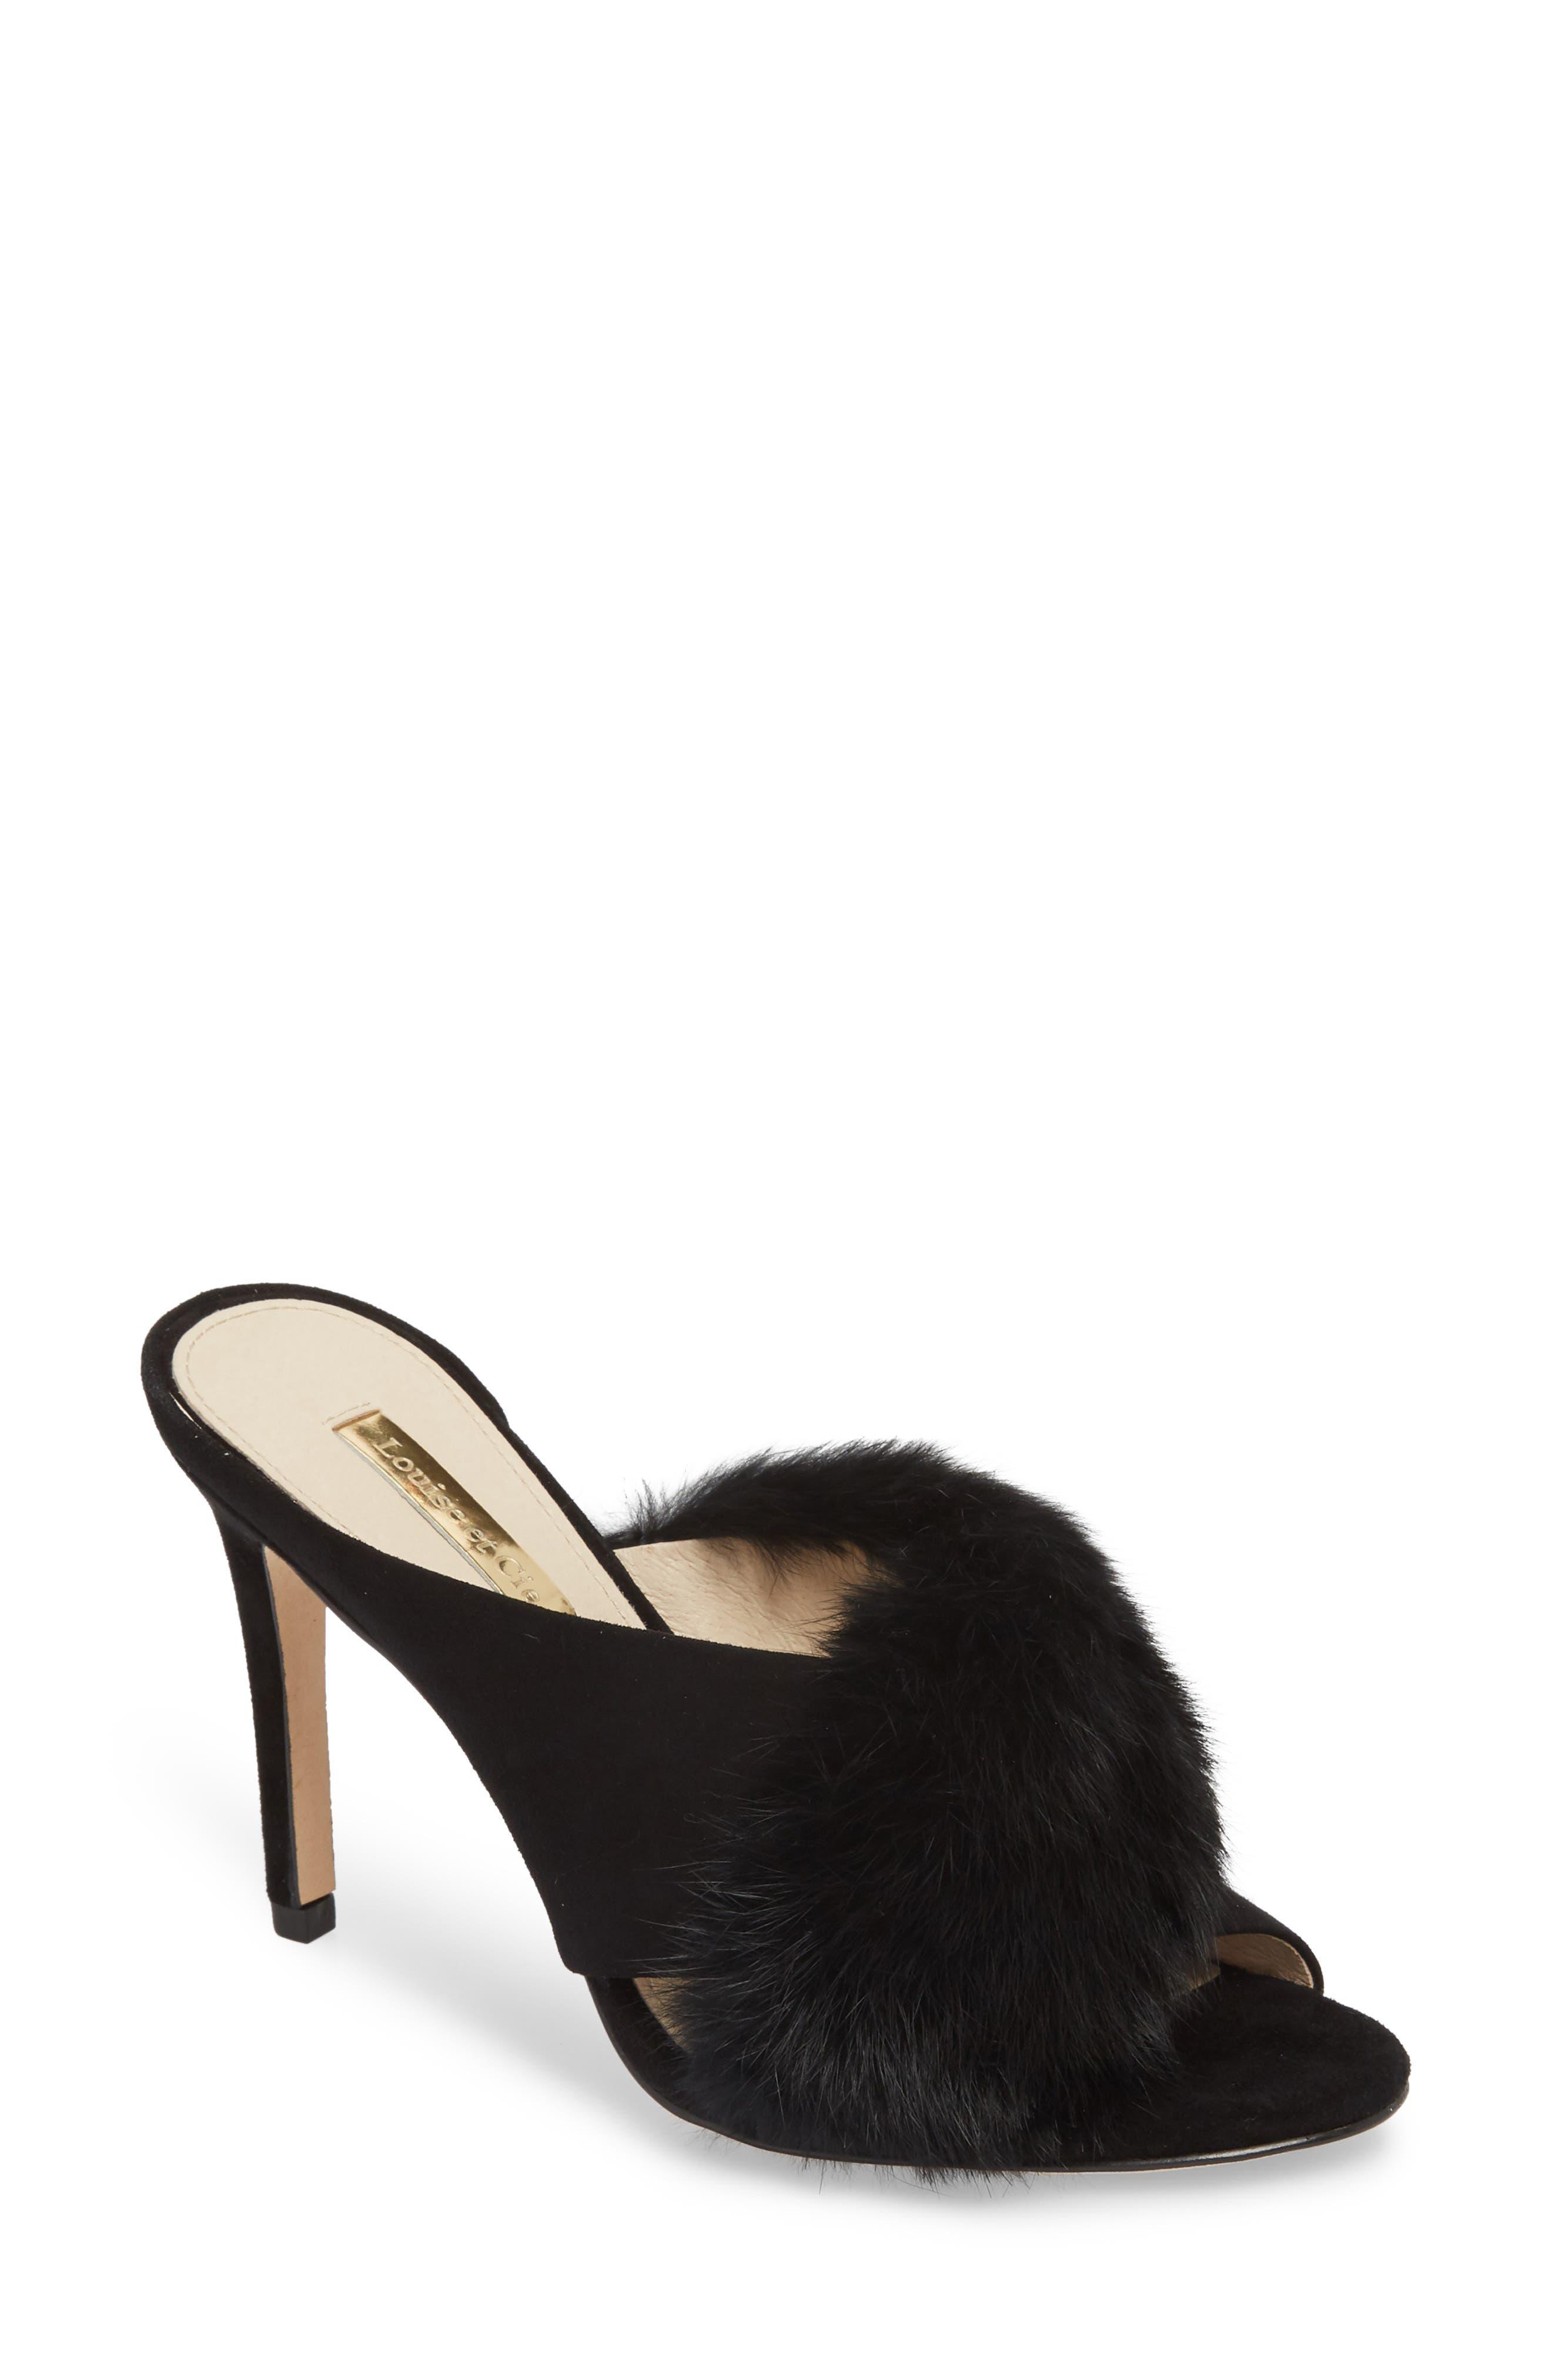 Halloway Genuine Rabbit Fur Sandal,                             Main thumbnail 1, color,                             BLACK RABBIT FUR